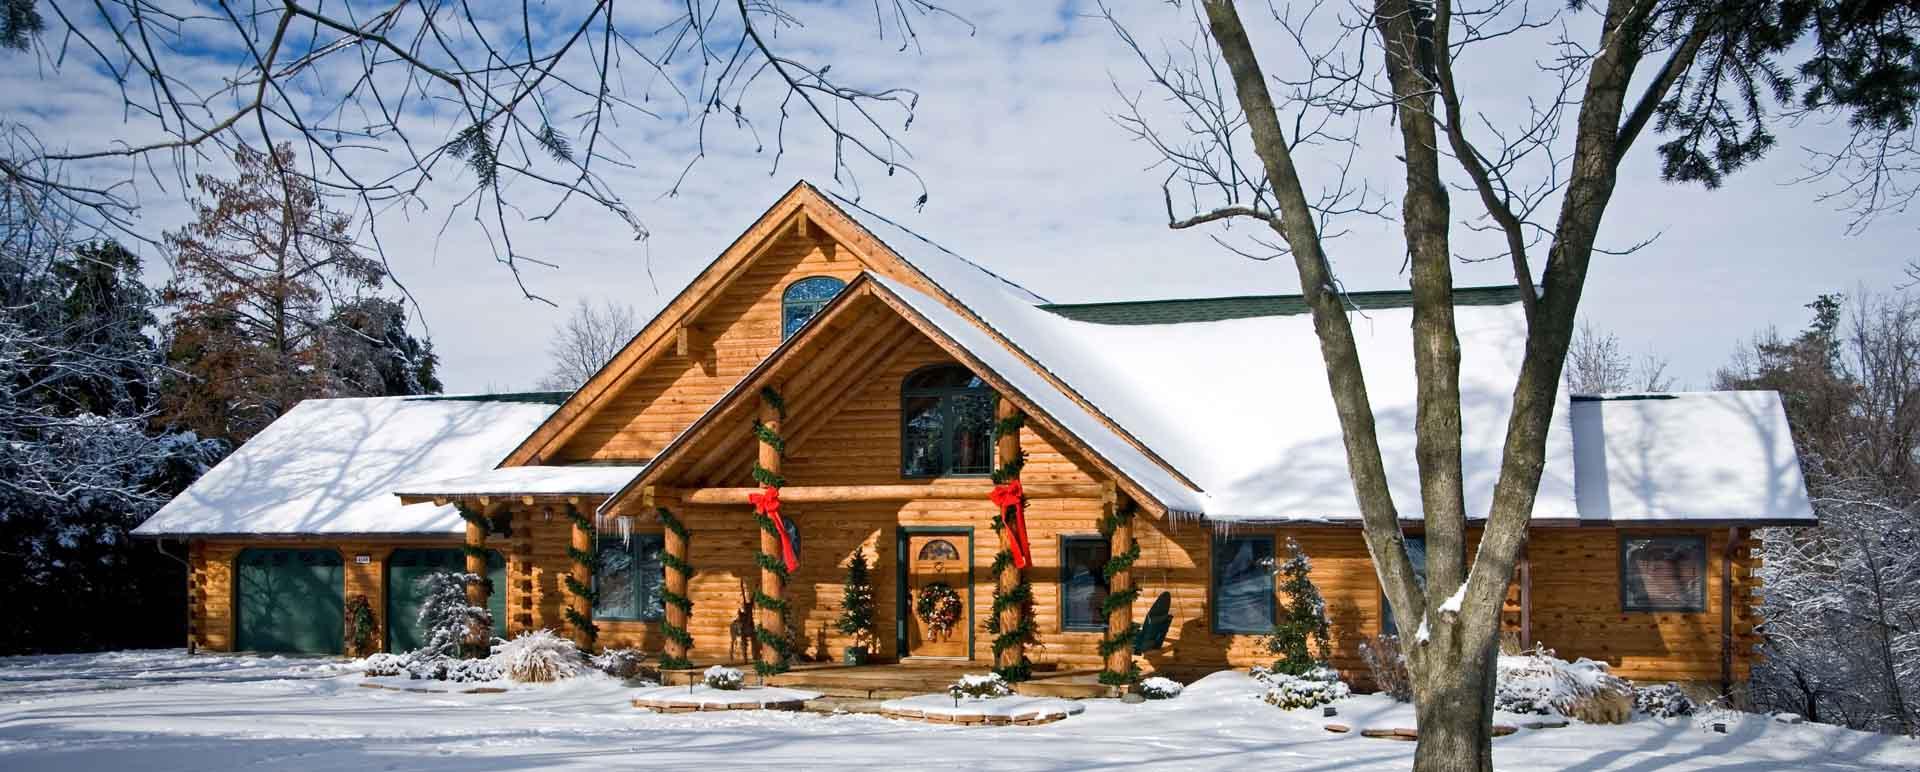 Snowy Illinois Log Cabin